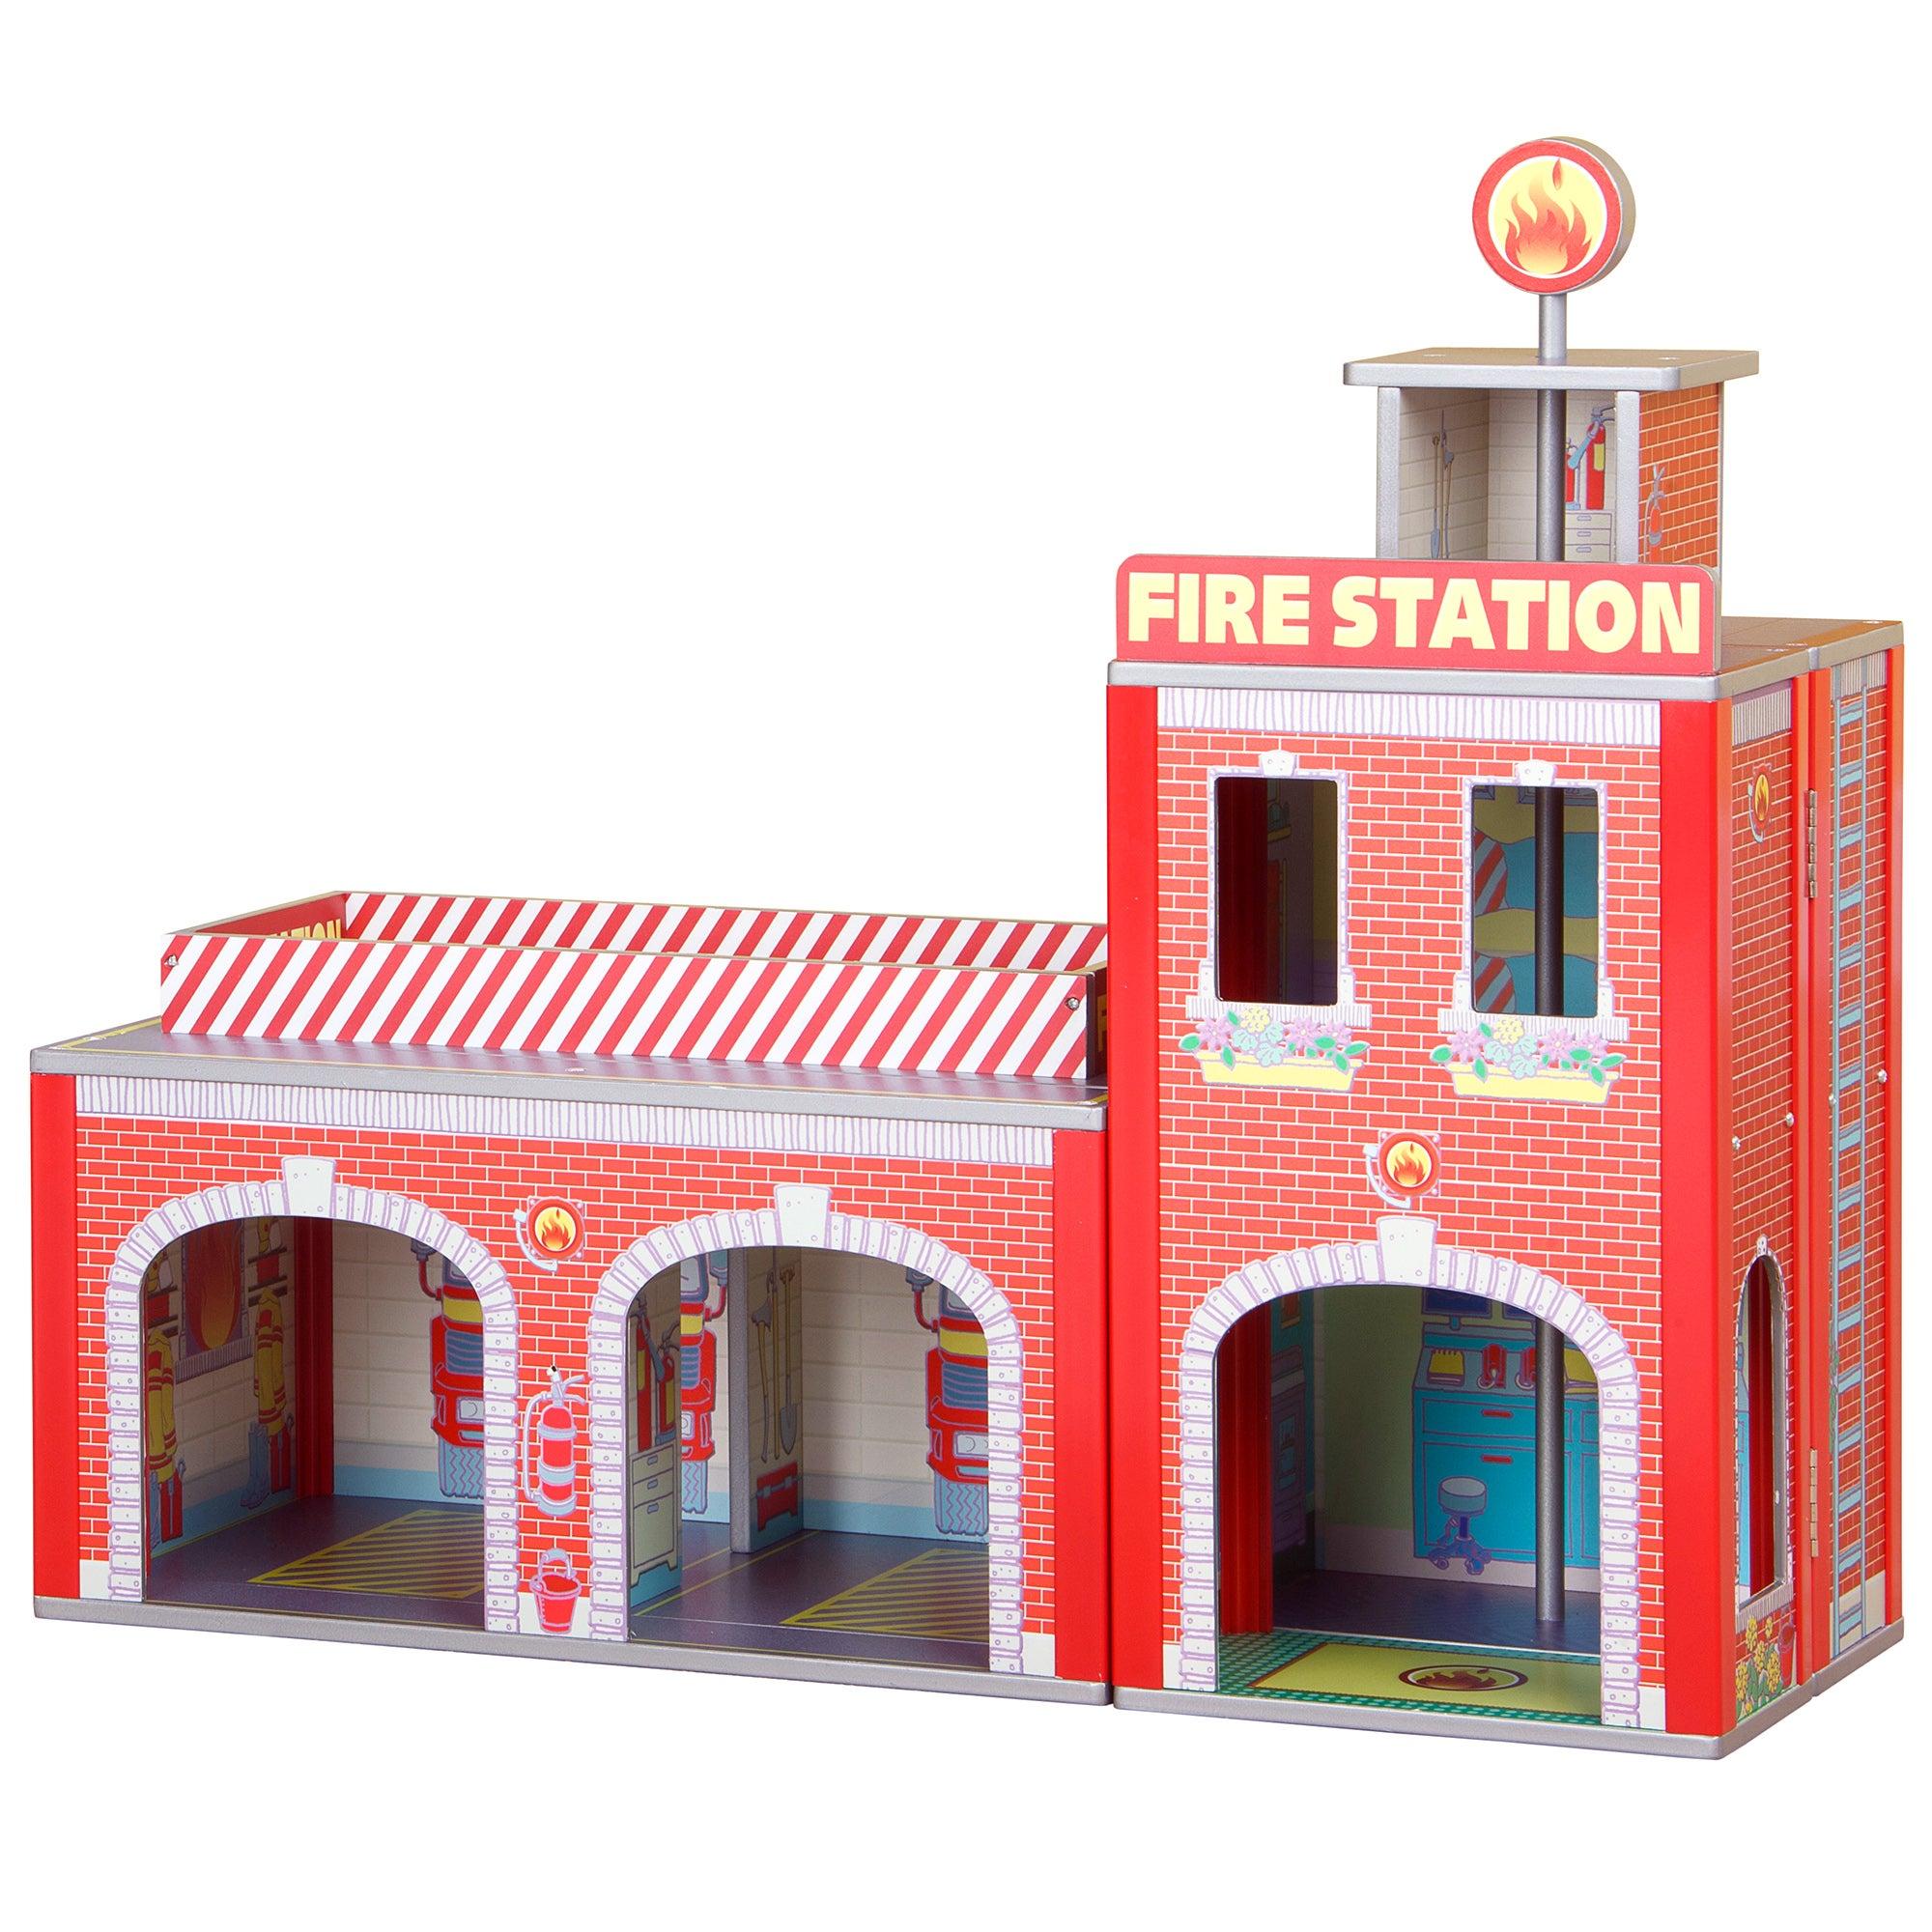 Plum Ingham Fire Station Play Set